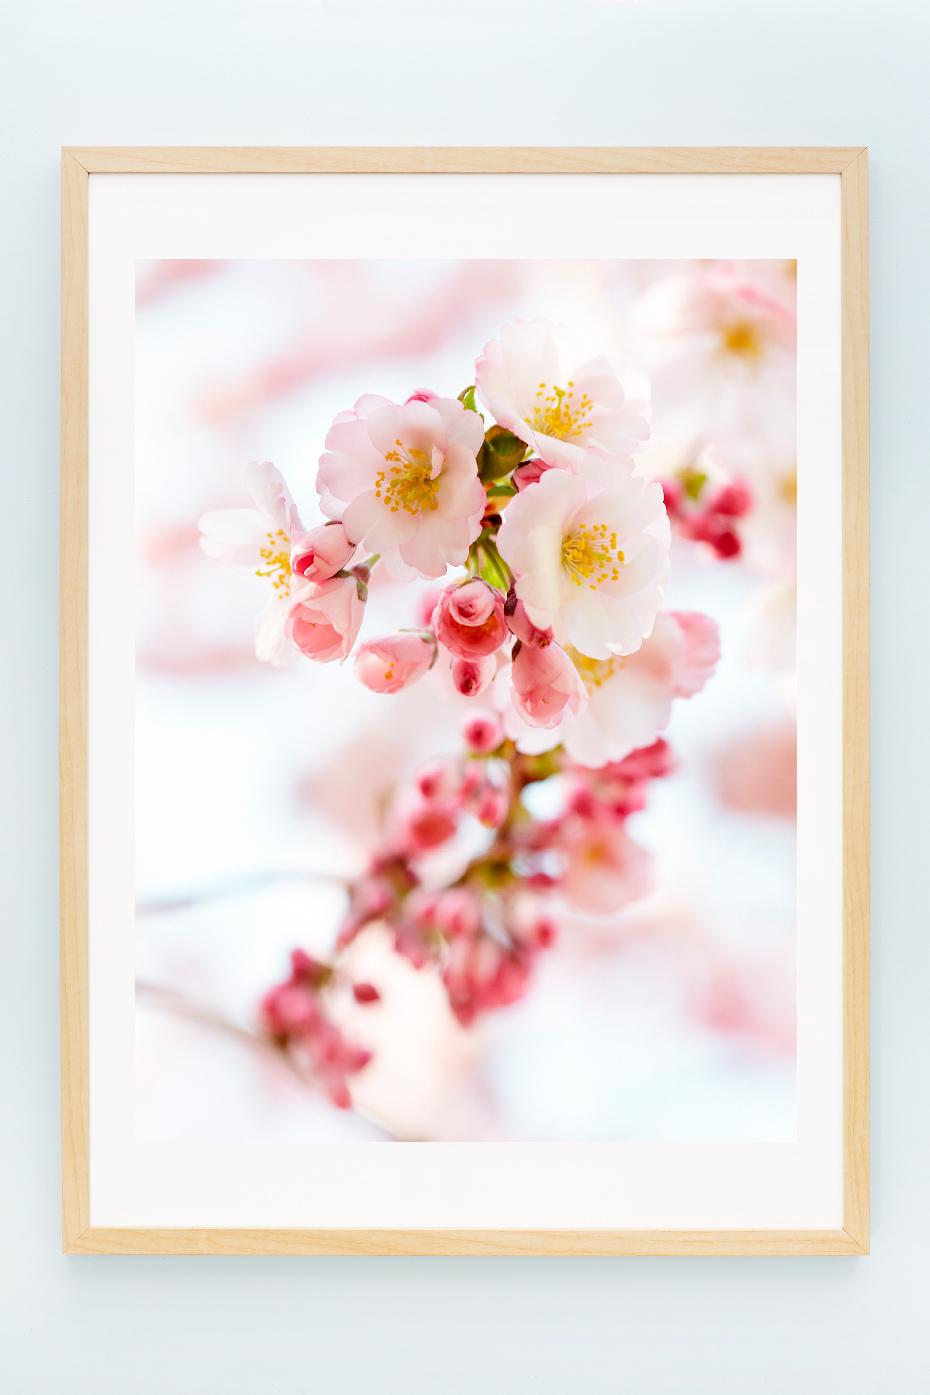 1_Blossoms_I.jpg